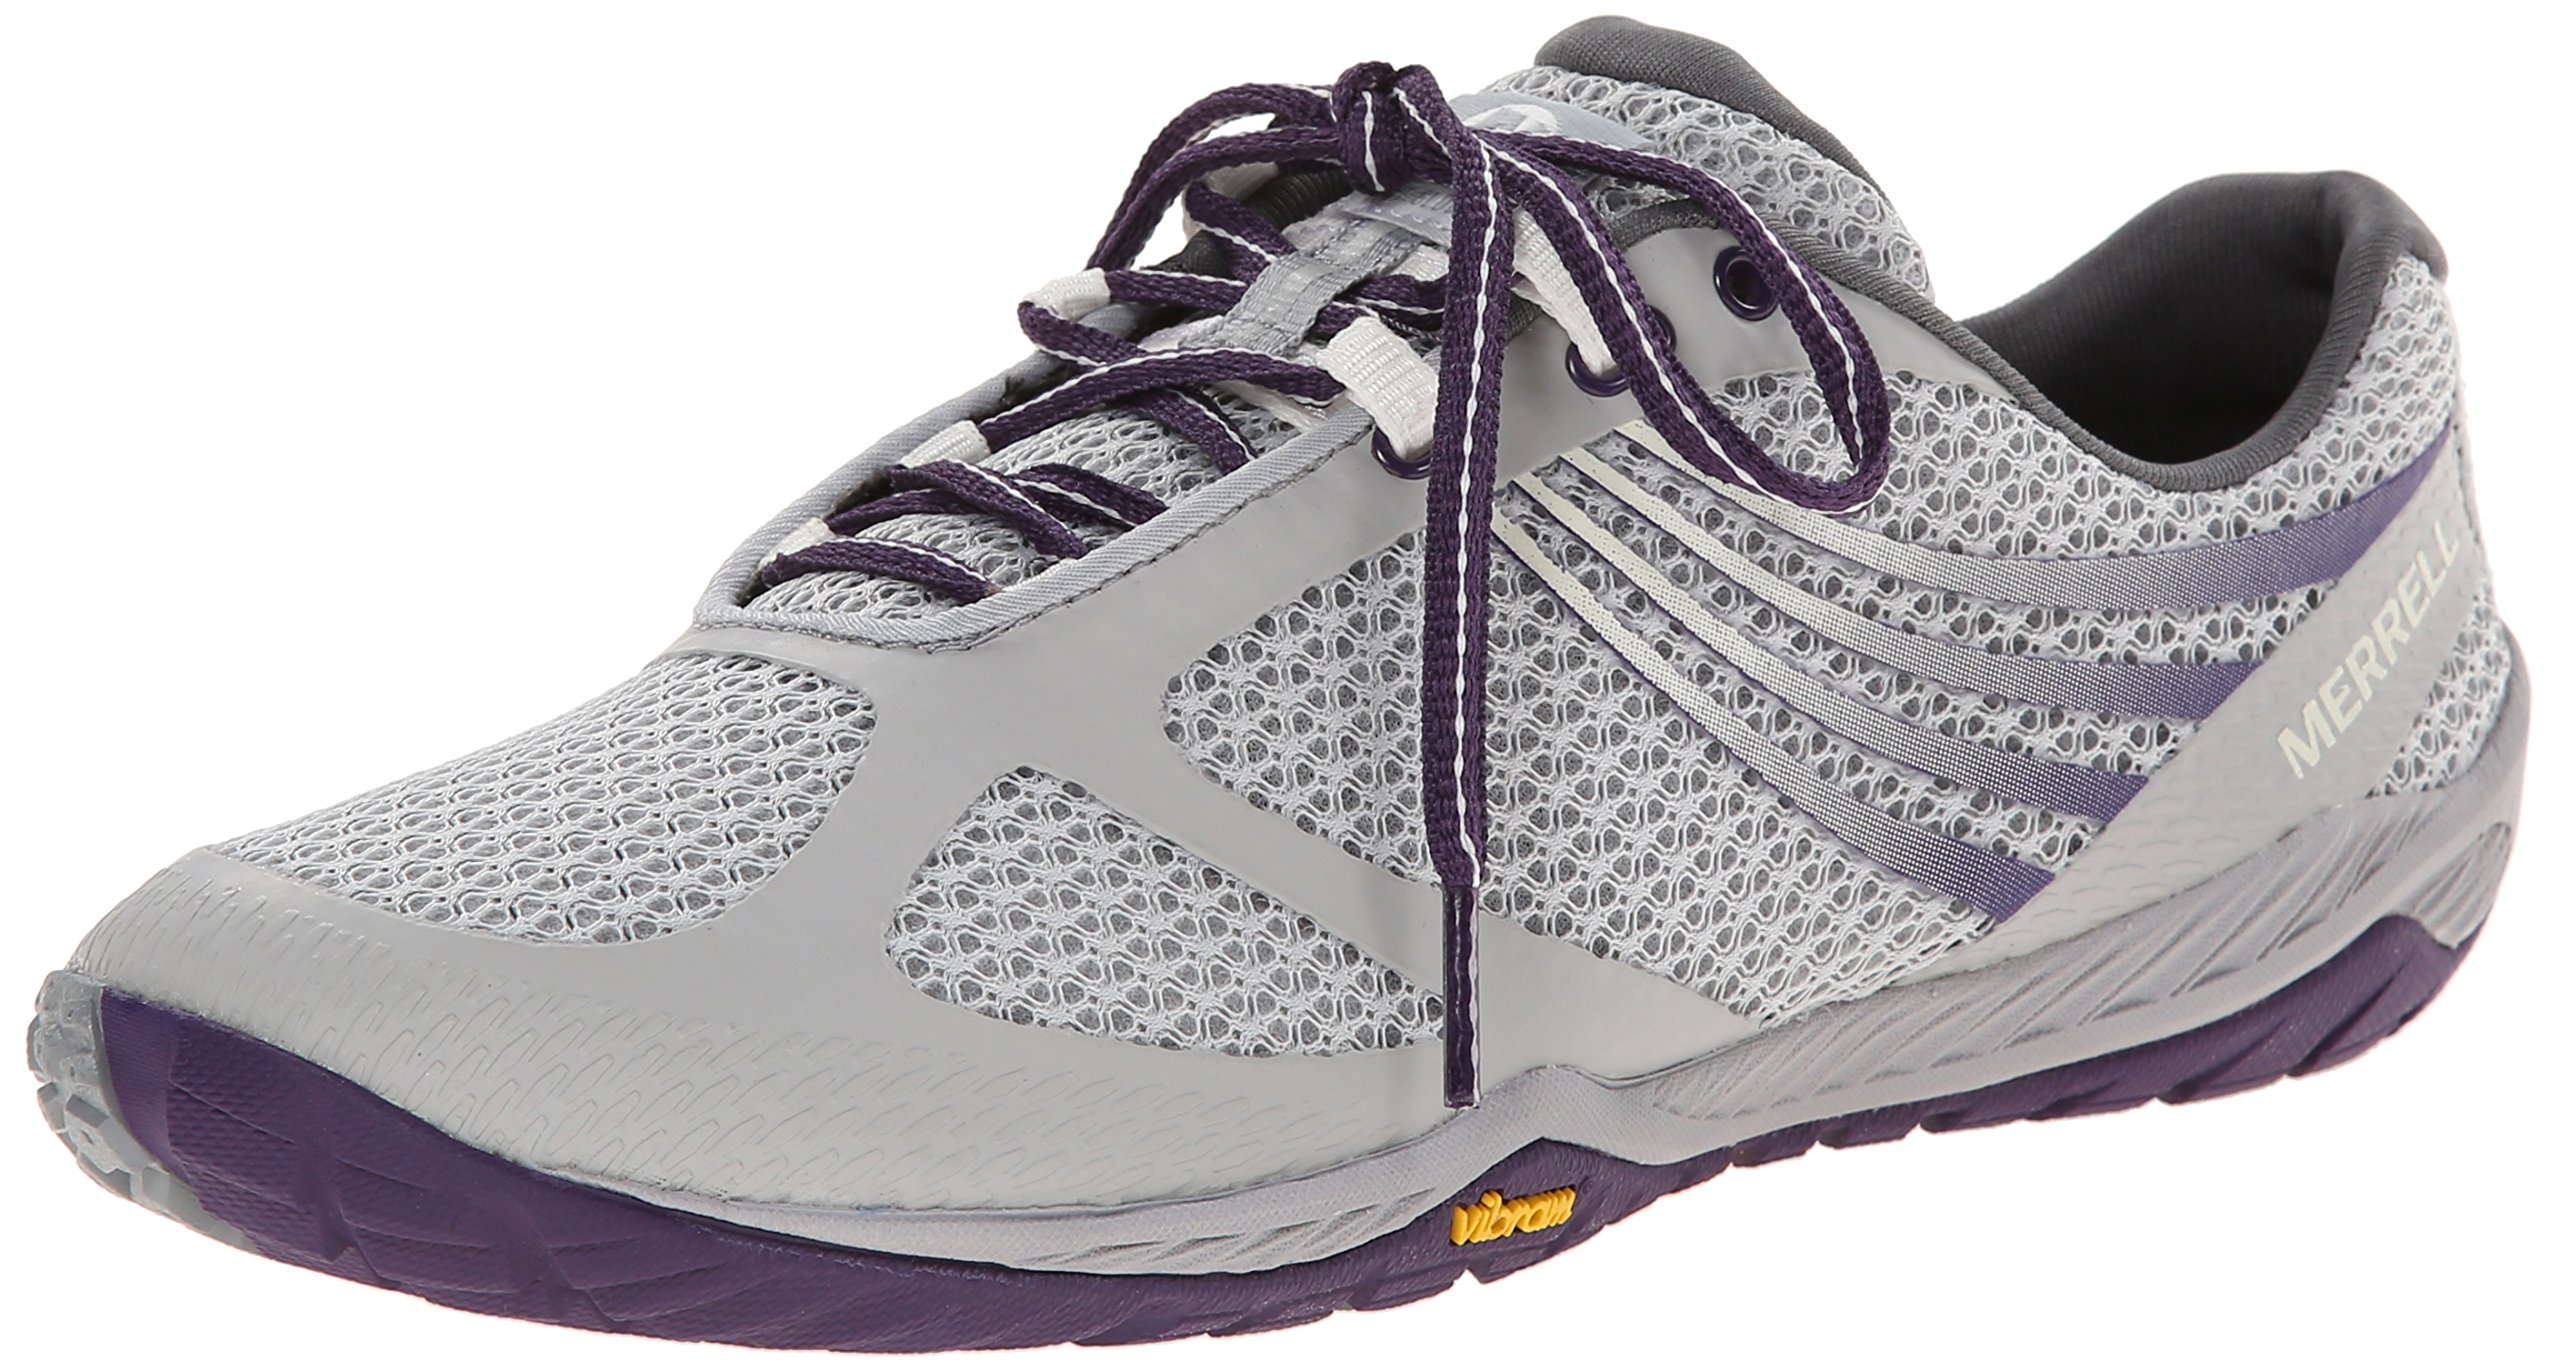 Merrell Women's Pace Glove 3 Trail Running Shoe,Light Grey/Parachute Purple,10 M US